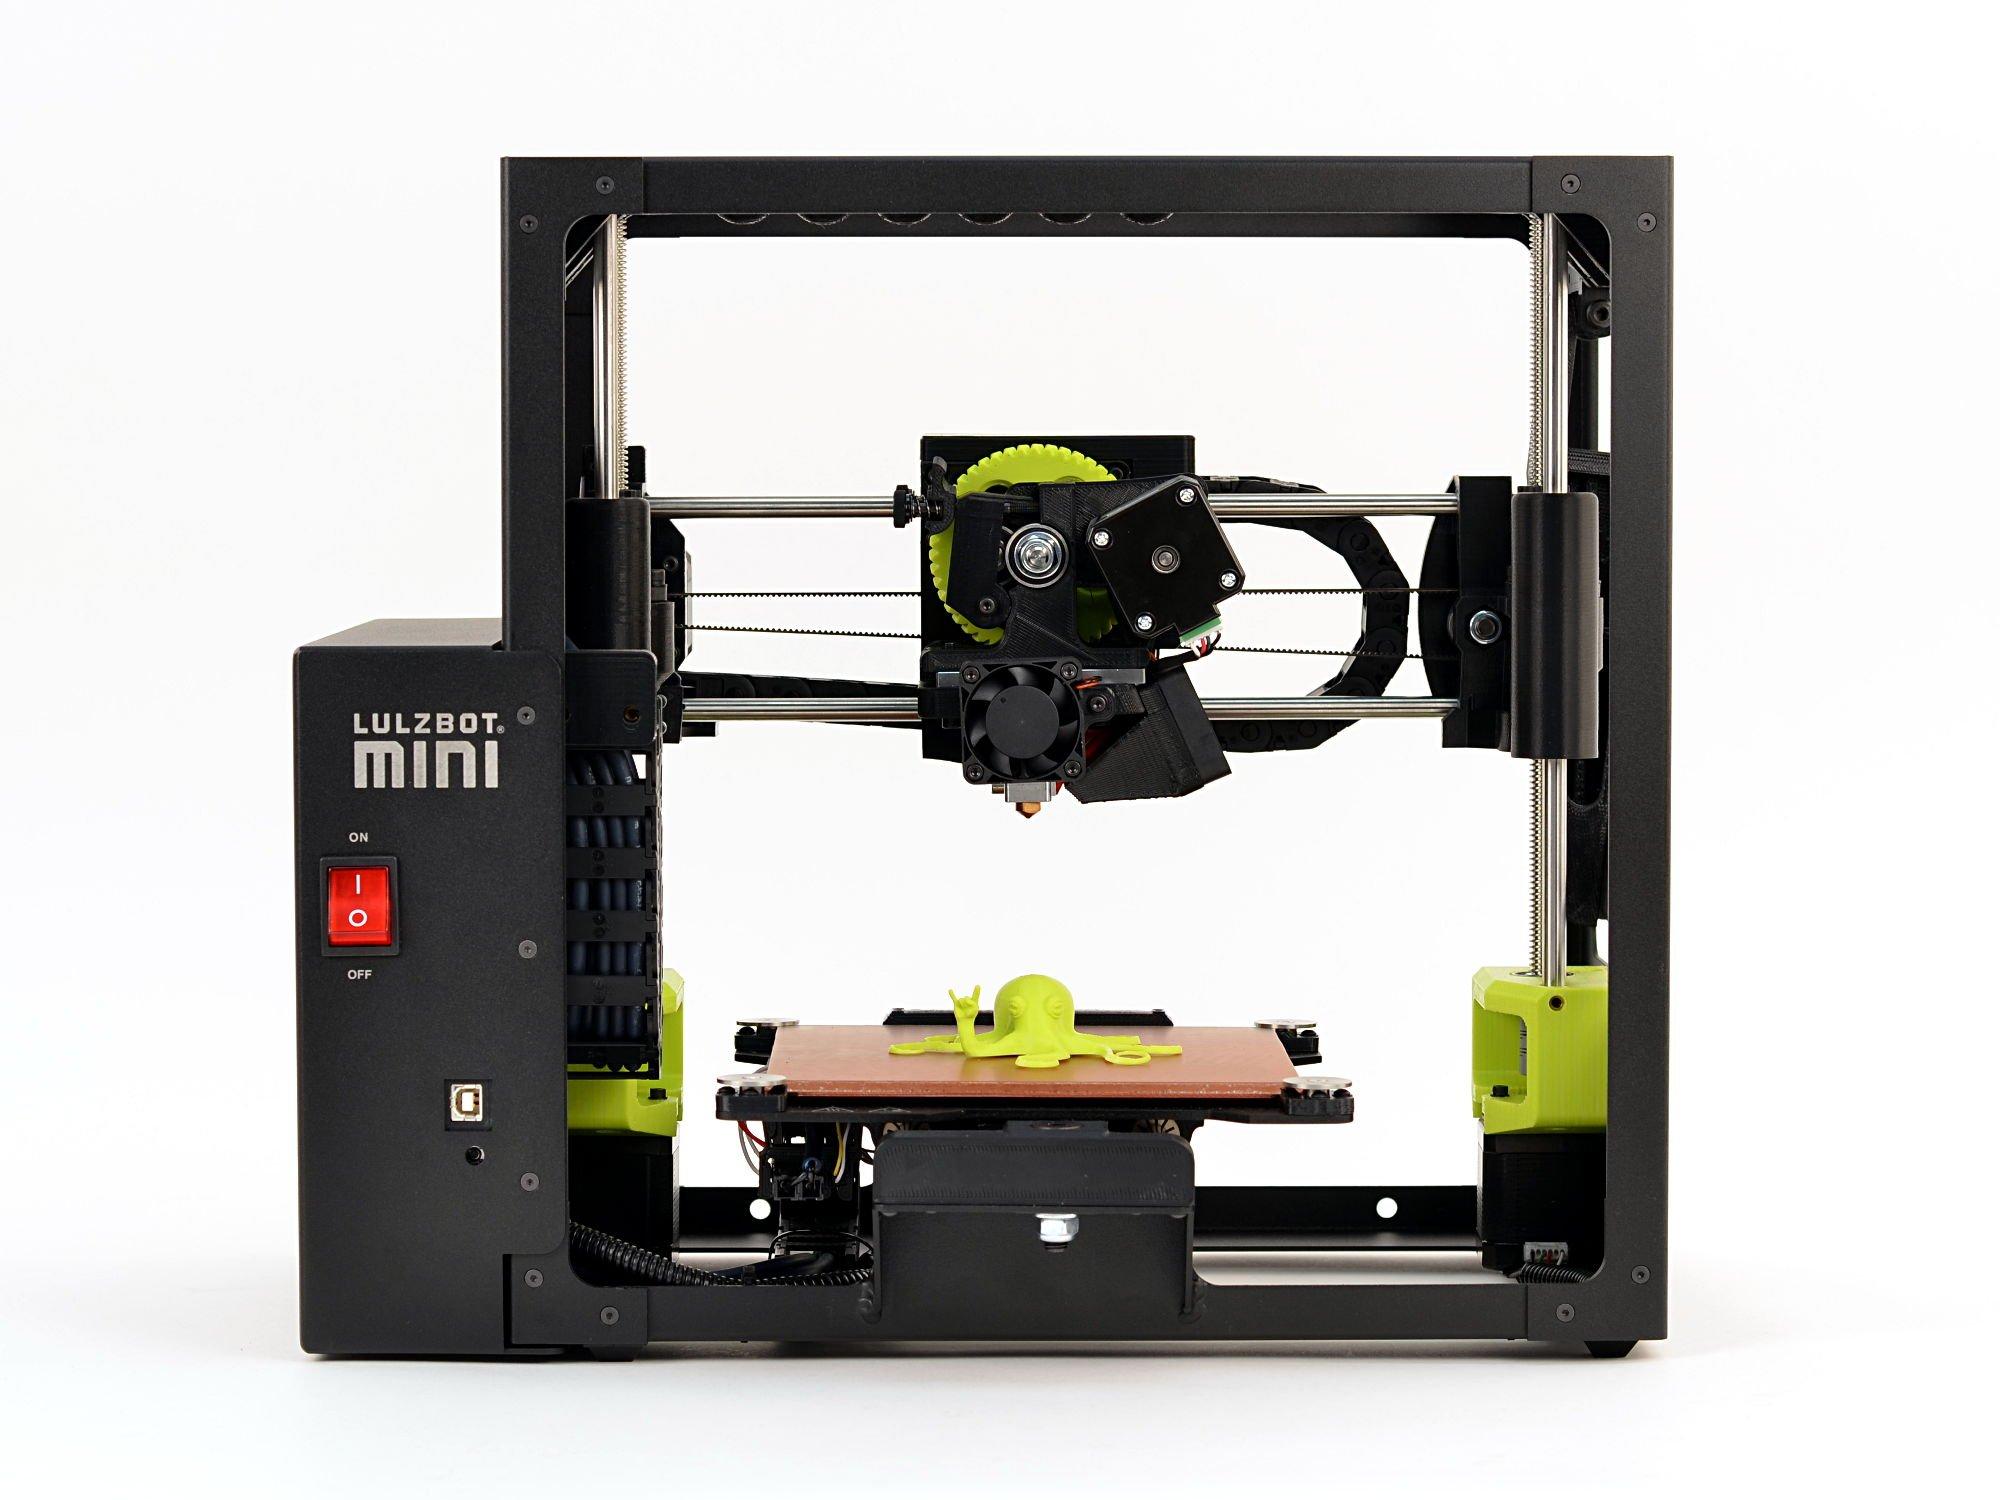 LulzBot Mini Desktop 3D Printer by LulzBot